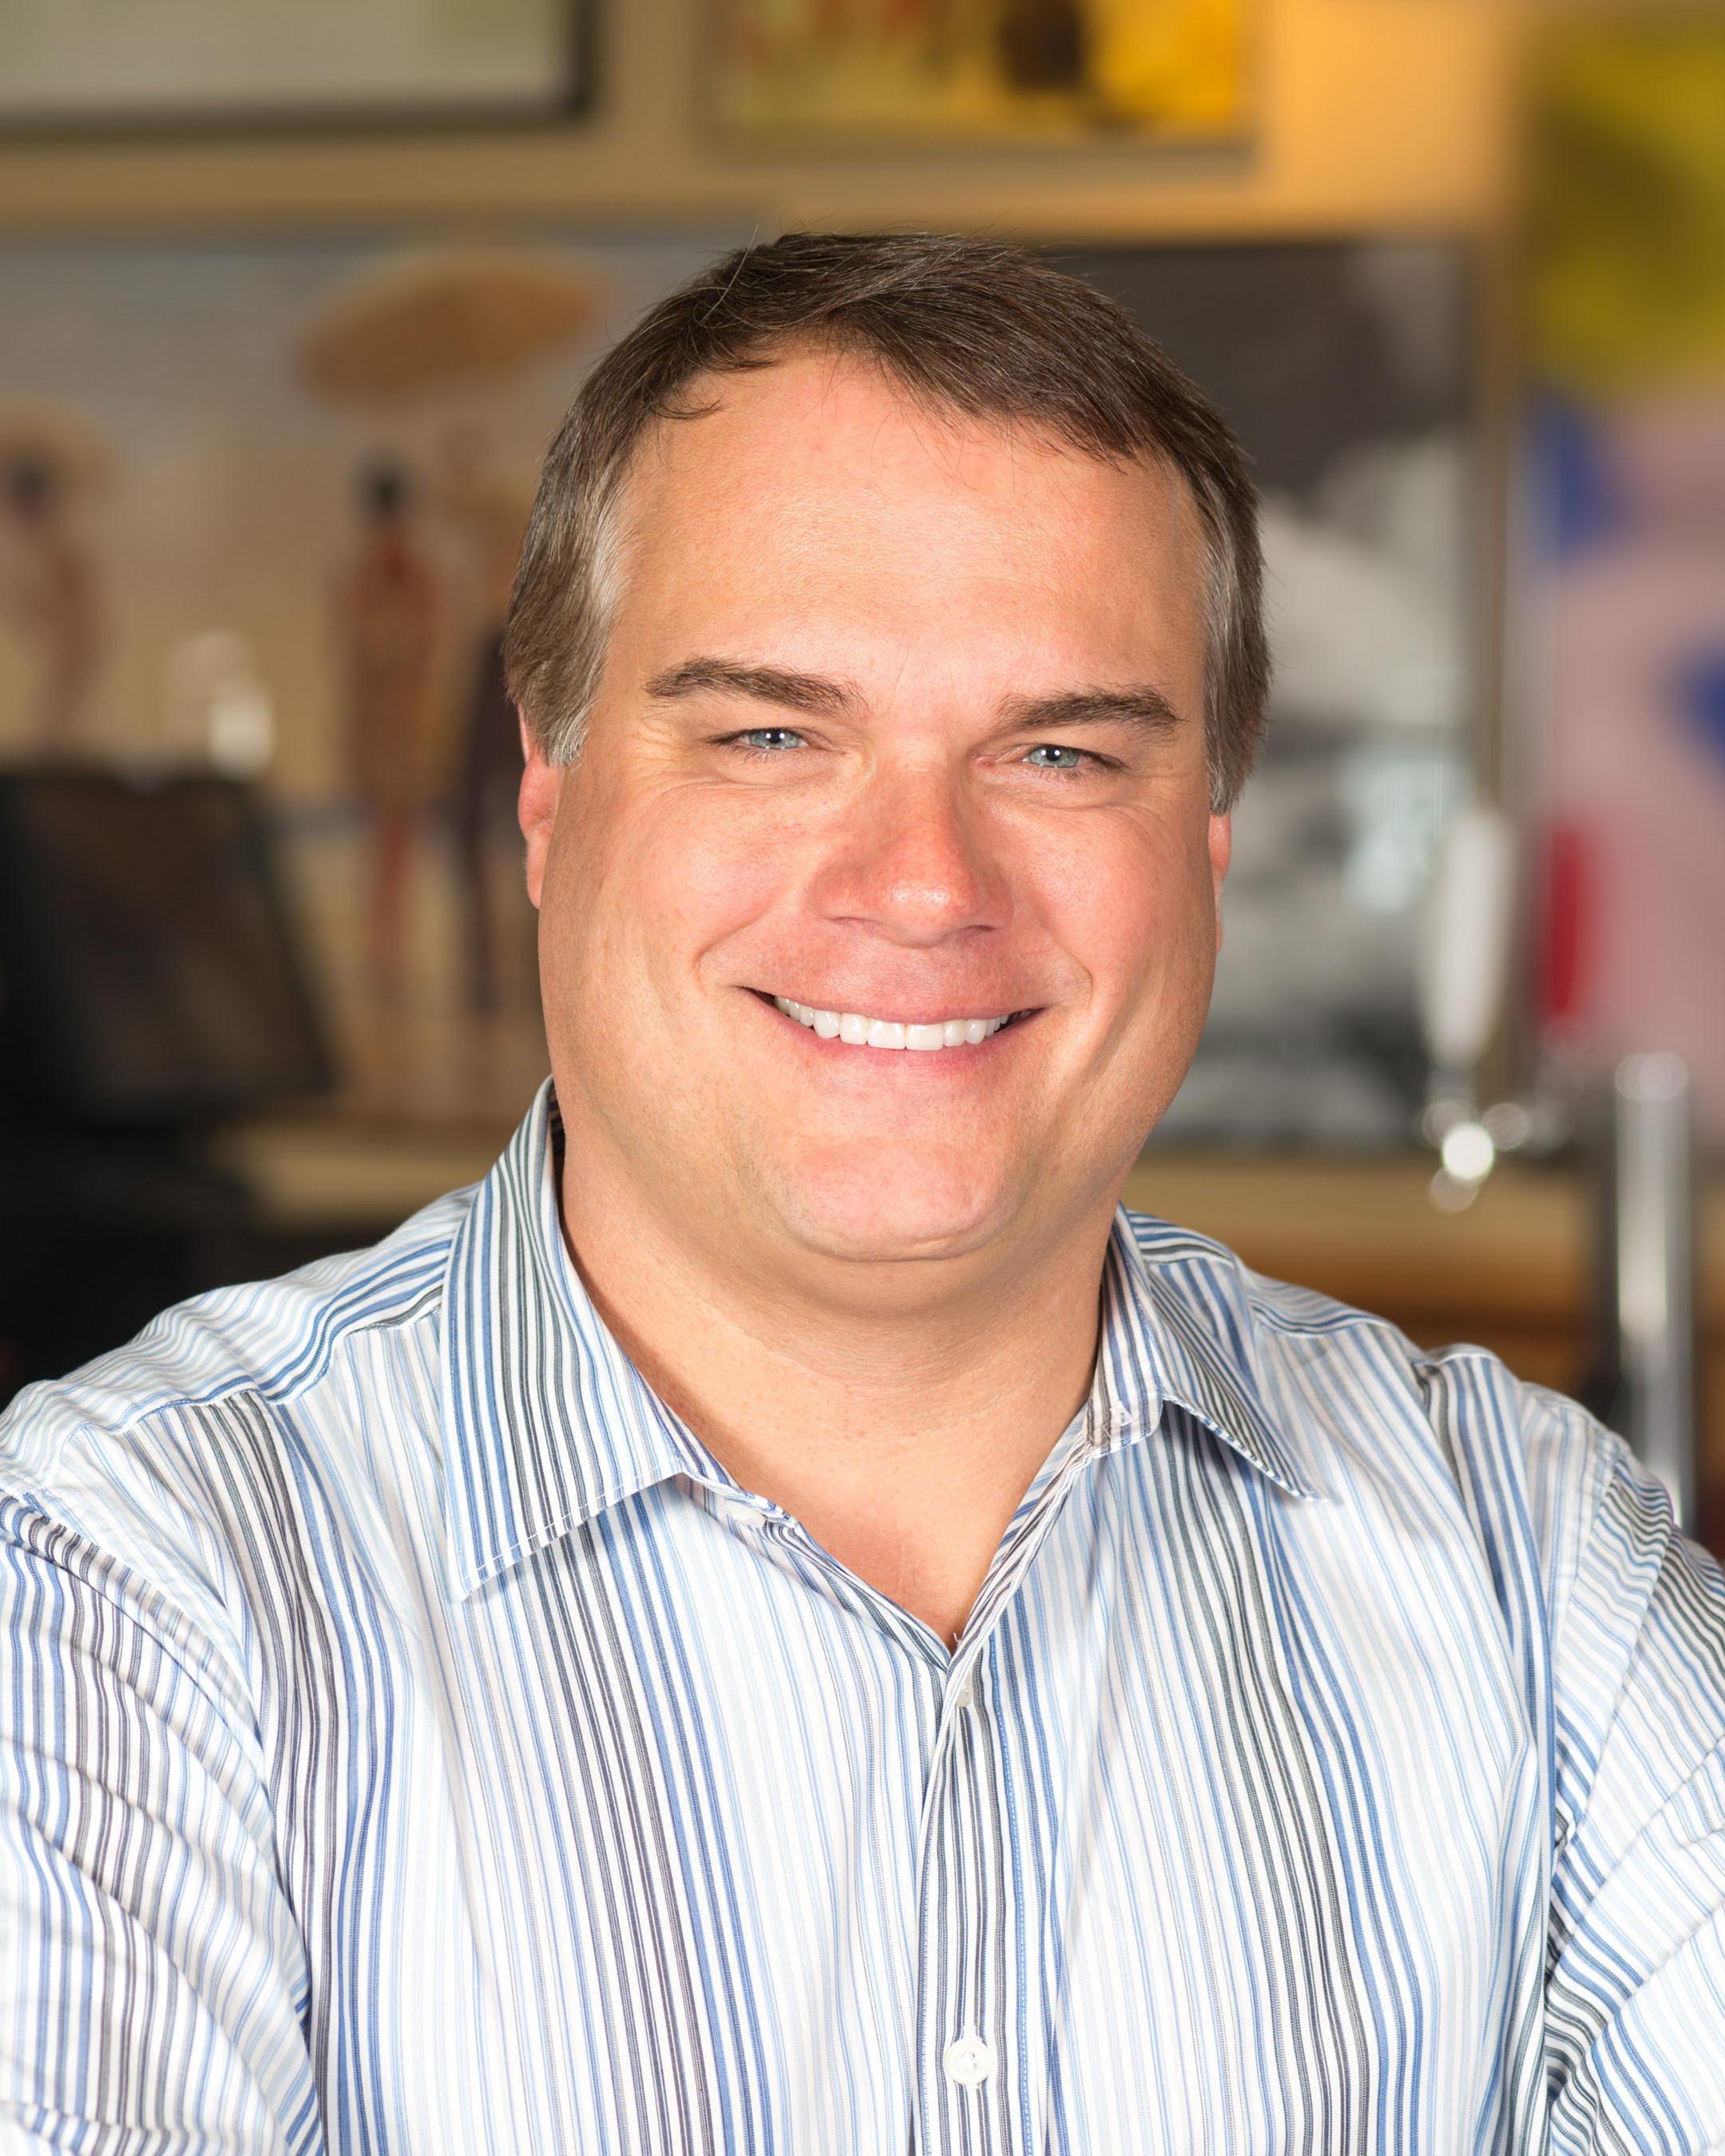 Red Robin appoints John Schaufelberger Vice President of Brand Marketing. (PRNewsFoto/Red Robin Gourmet Burgers, Inc.) (PRNewsFoto/RED ROBIN GOURMET BURGERS, INC.)